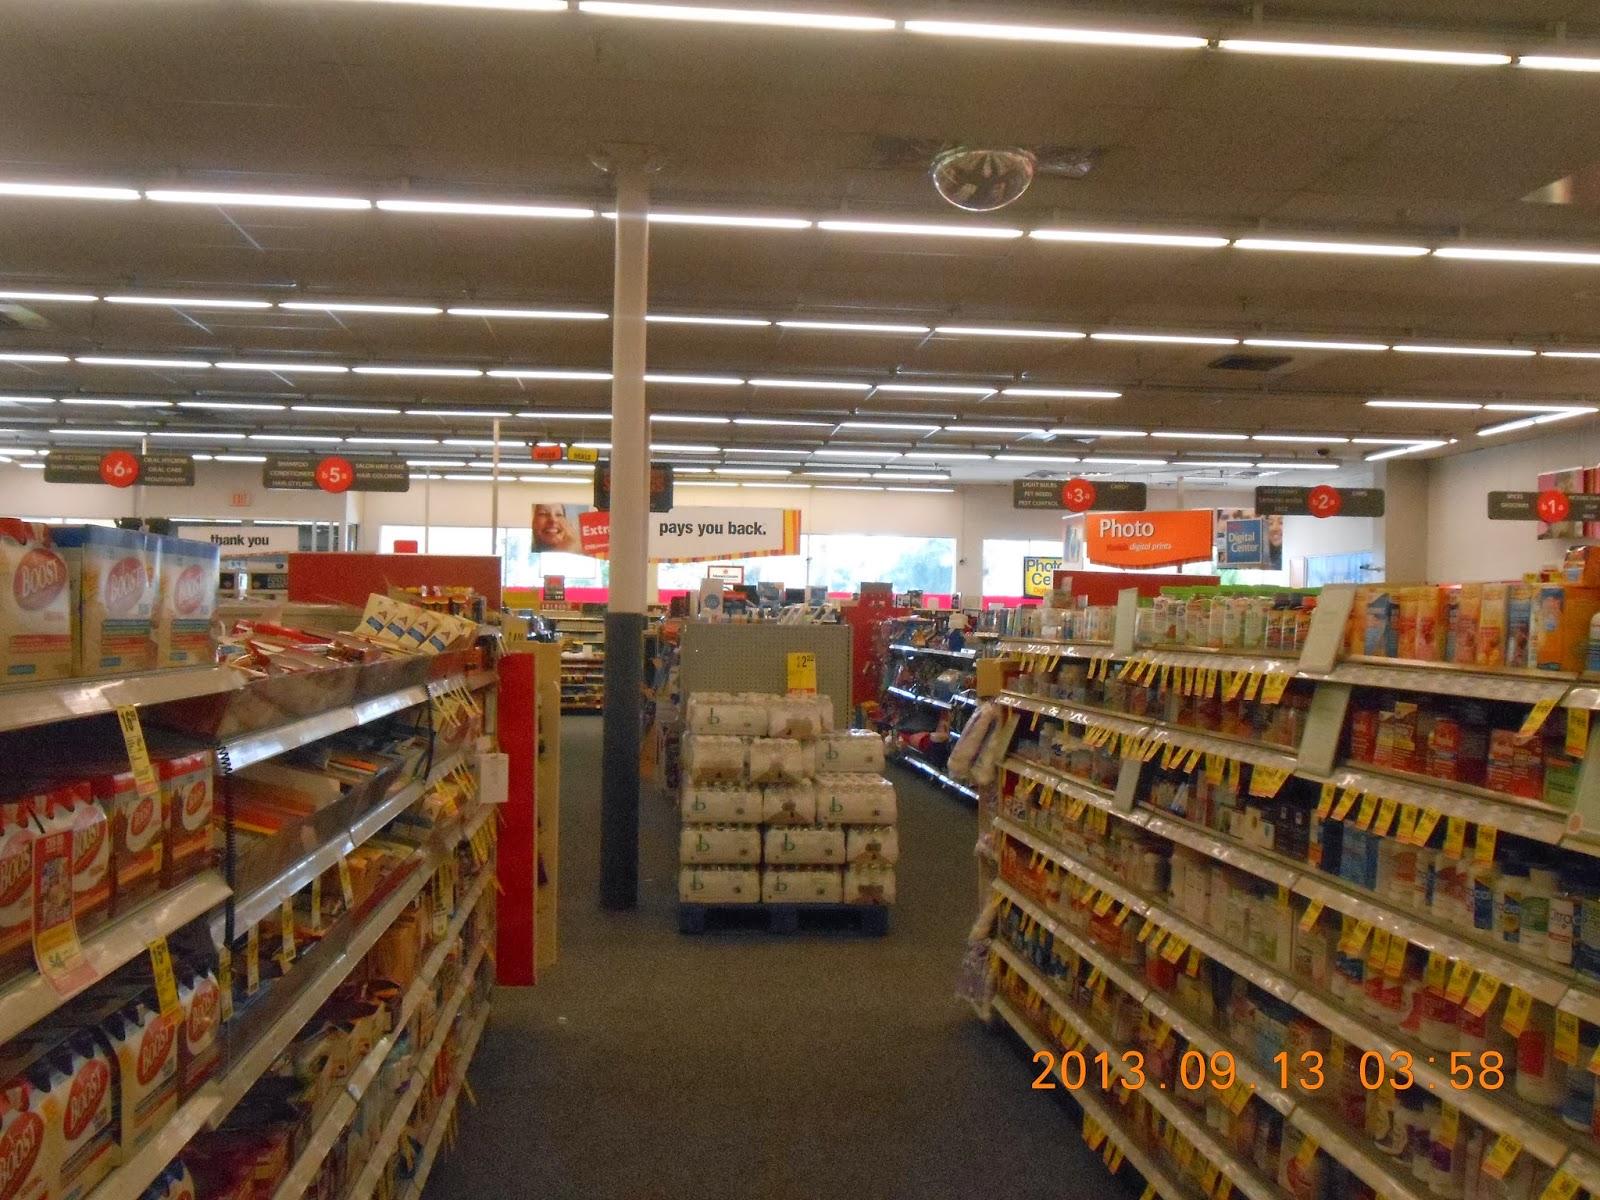 The Wag - The Walgreens Blog: CVS Pharmacy (Eckerd) (Military ...